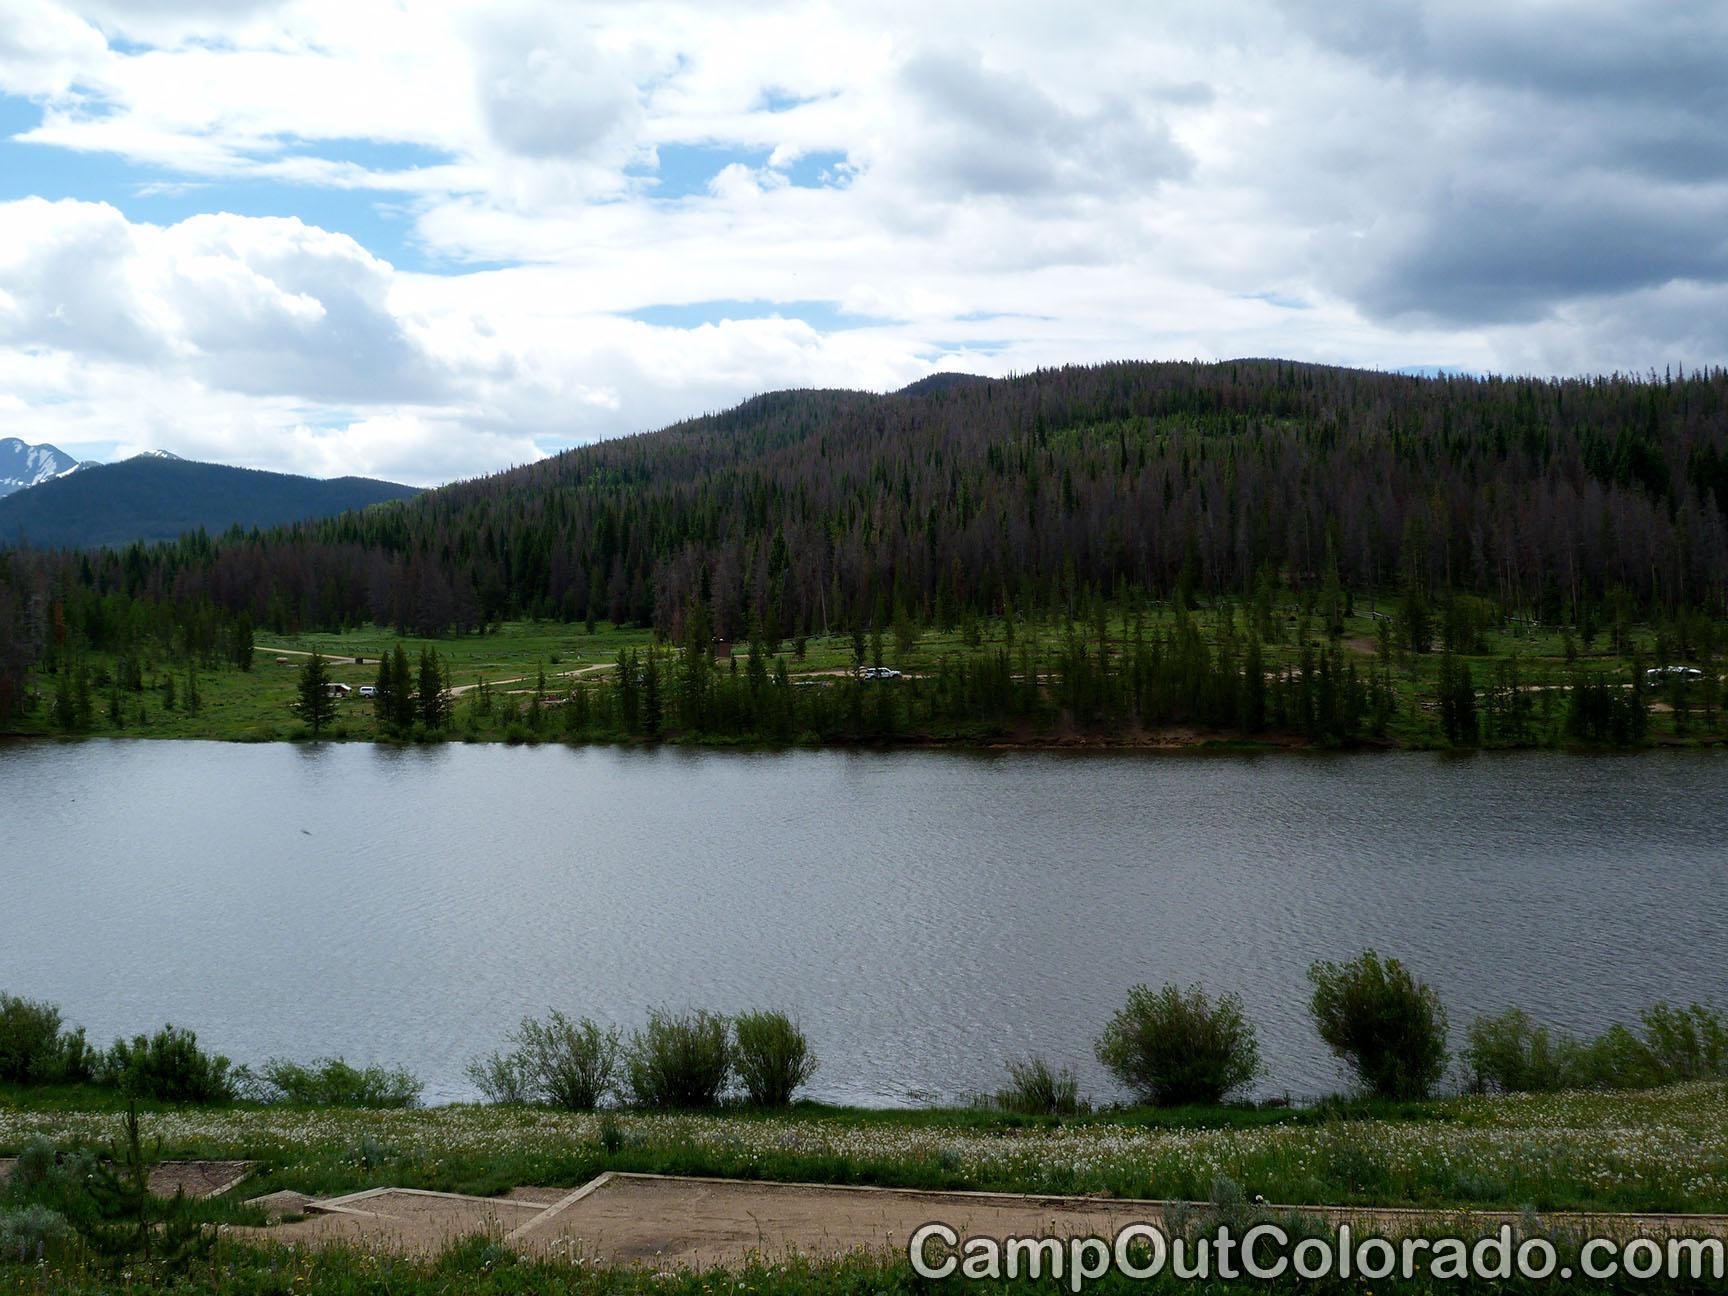 Campoutcolorado-north-michigan-reservoir-campground-beetle-kill